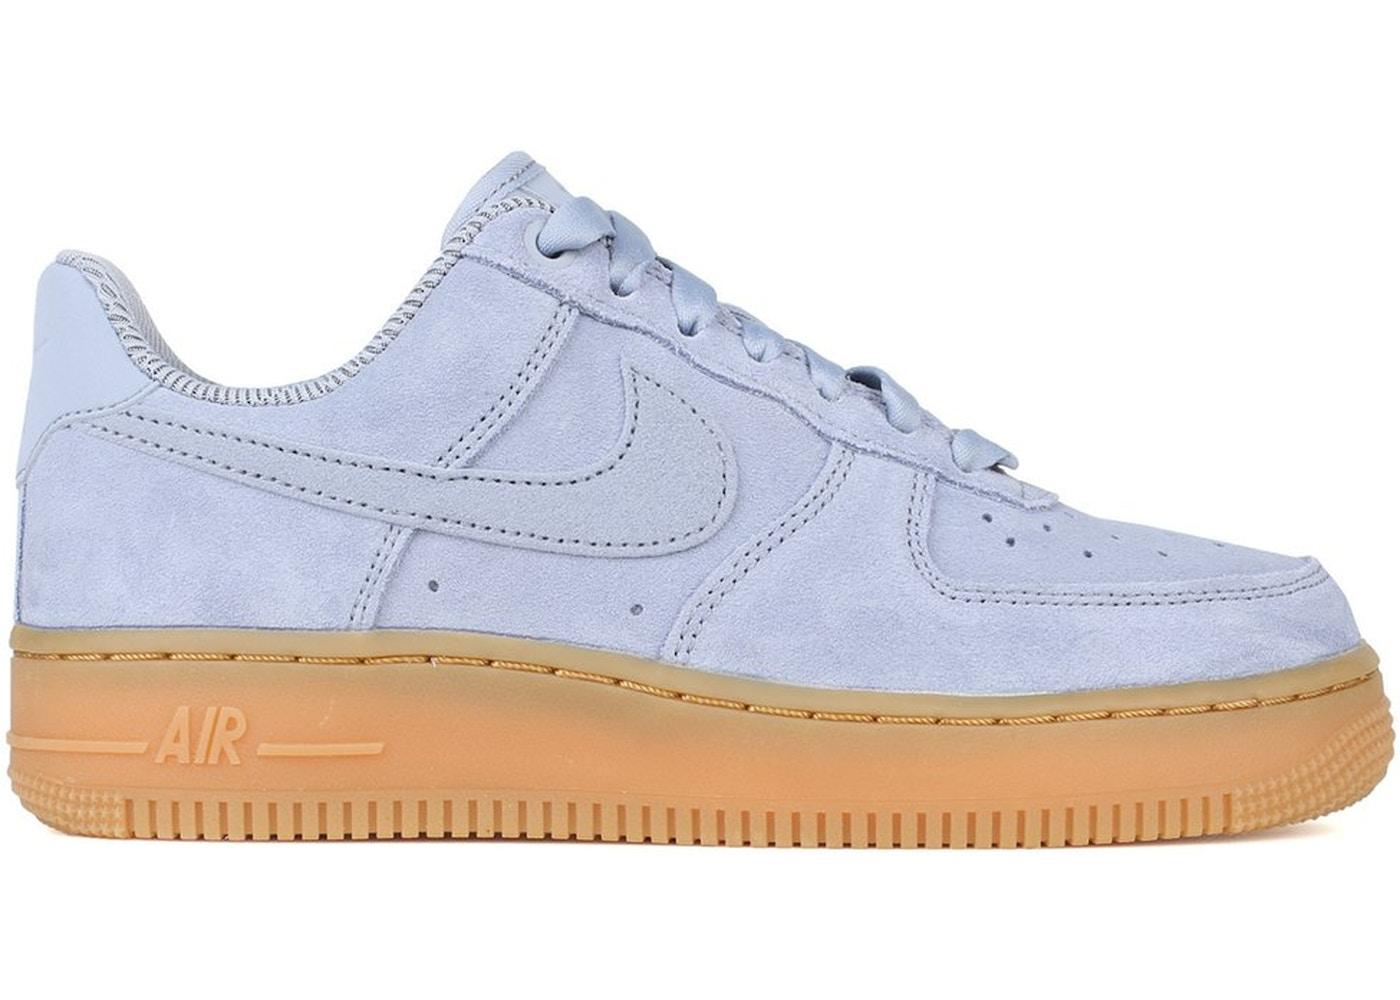 Nike Air Force 1 Low Glacier Grey Gum (W) - AA0287-001